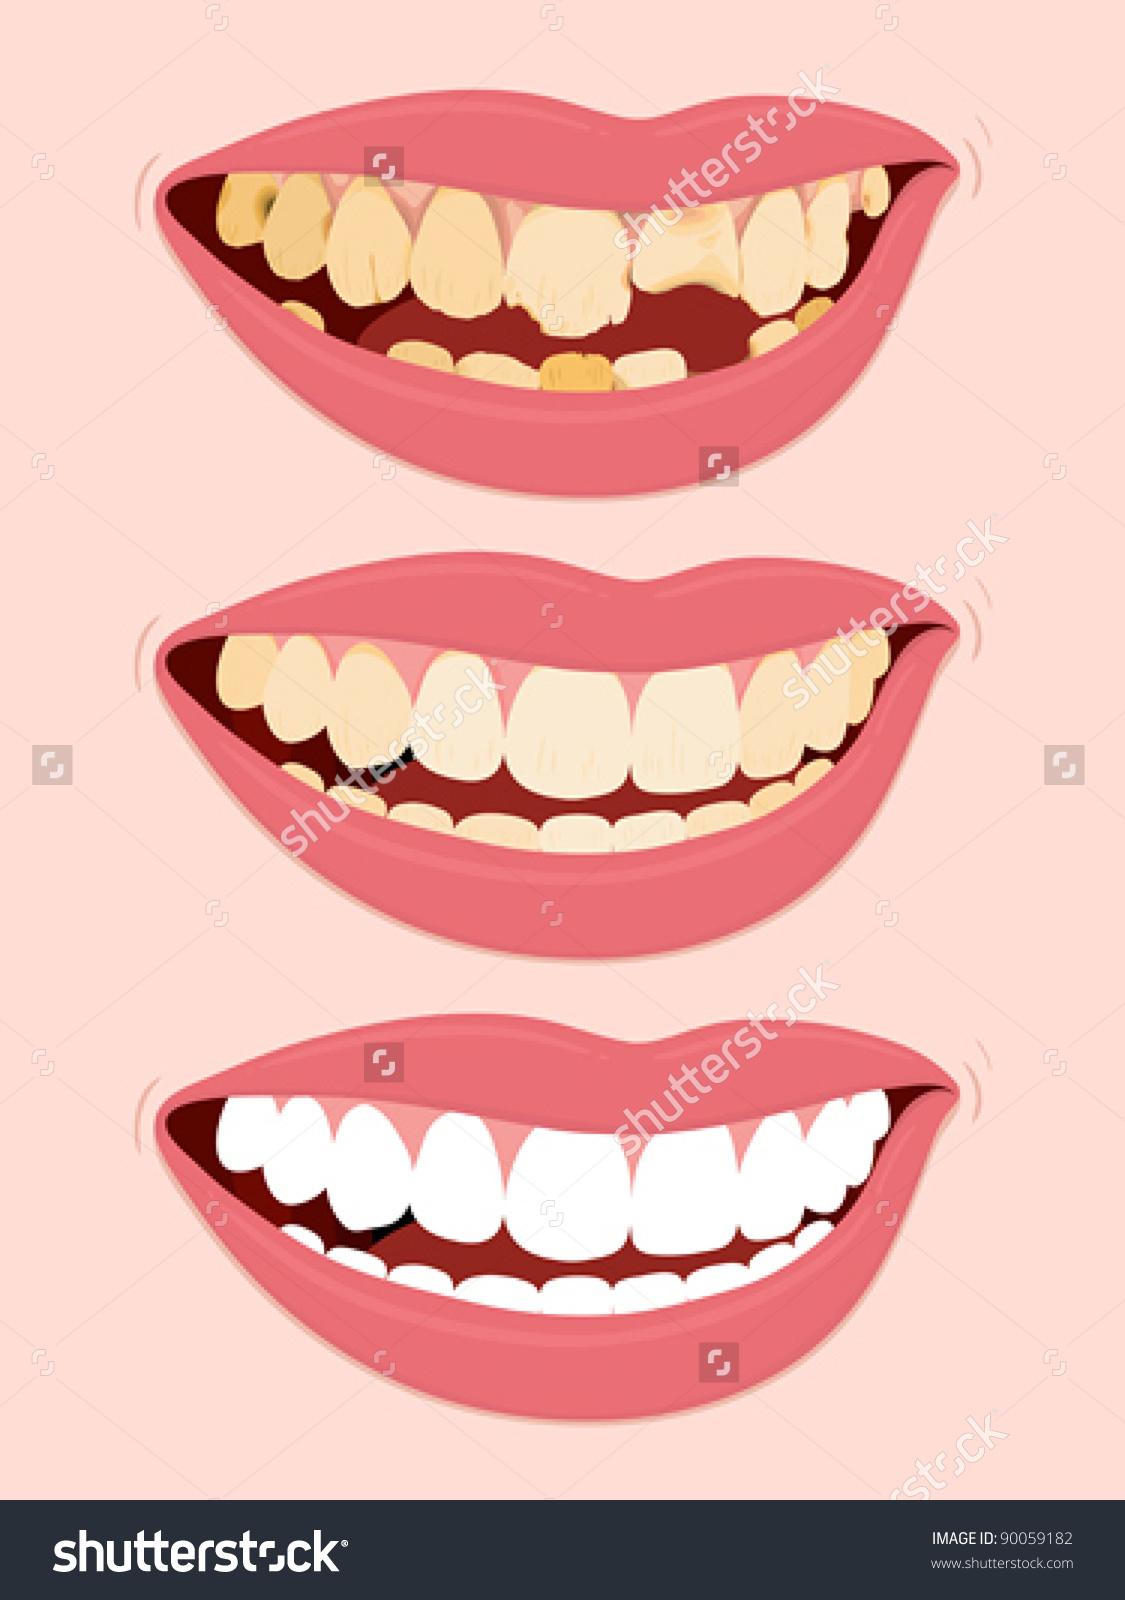 Tooth Cavity Clip Art.